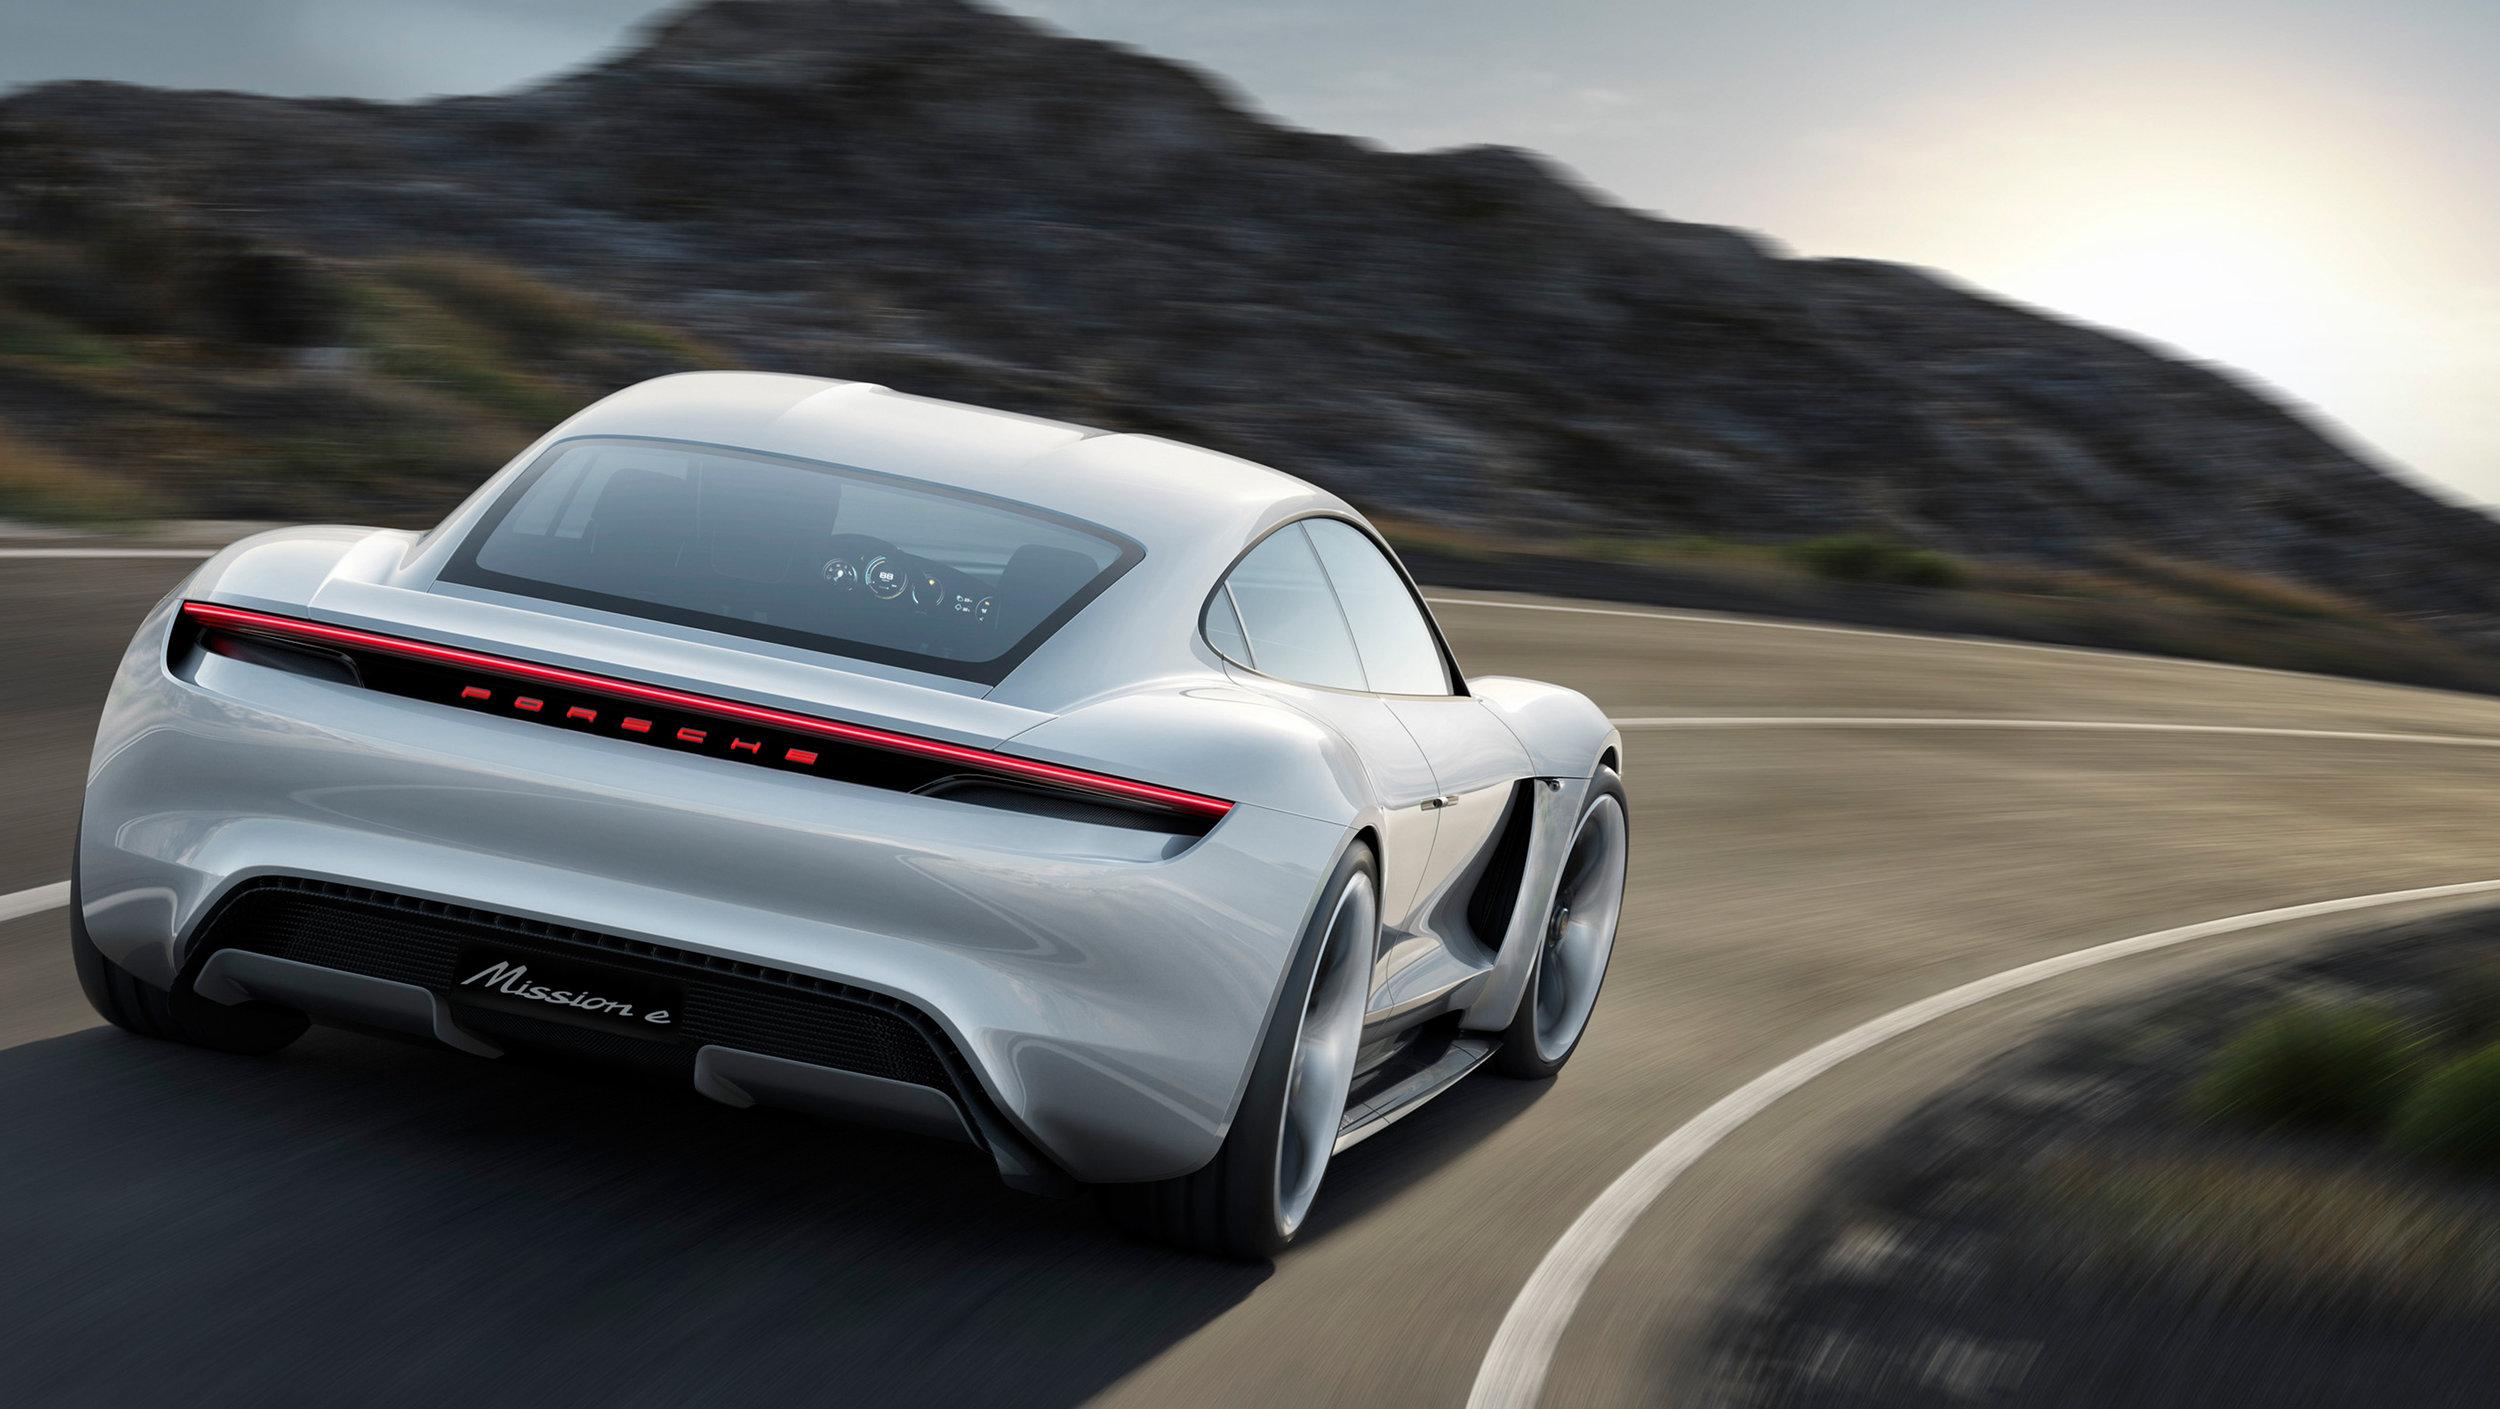 high_mission_e_concept_car_2015_porsche_ag.jpg